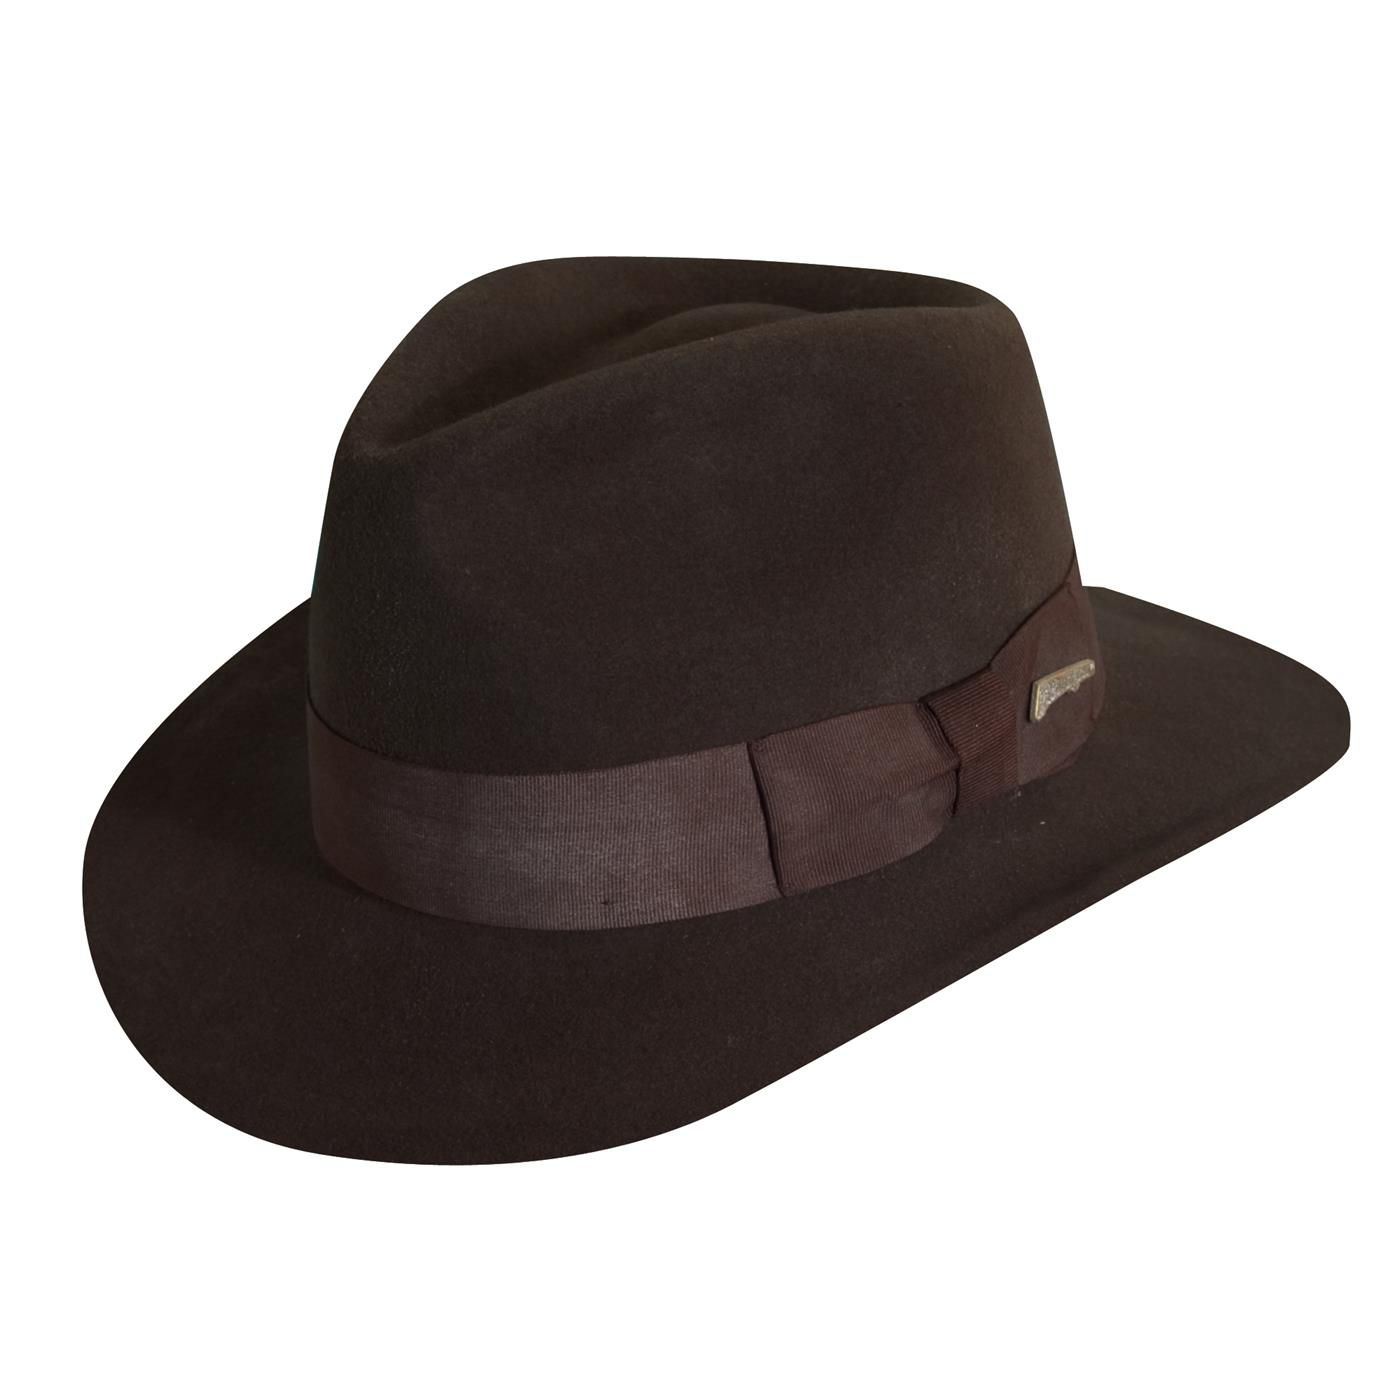 6c20aa8cc98f8 Dorfman Pacific Indiana Jones Men s Wool Felt 3 Inch Brim Fedora Hat ...